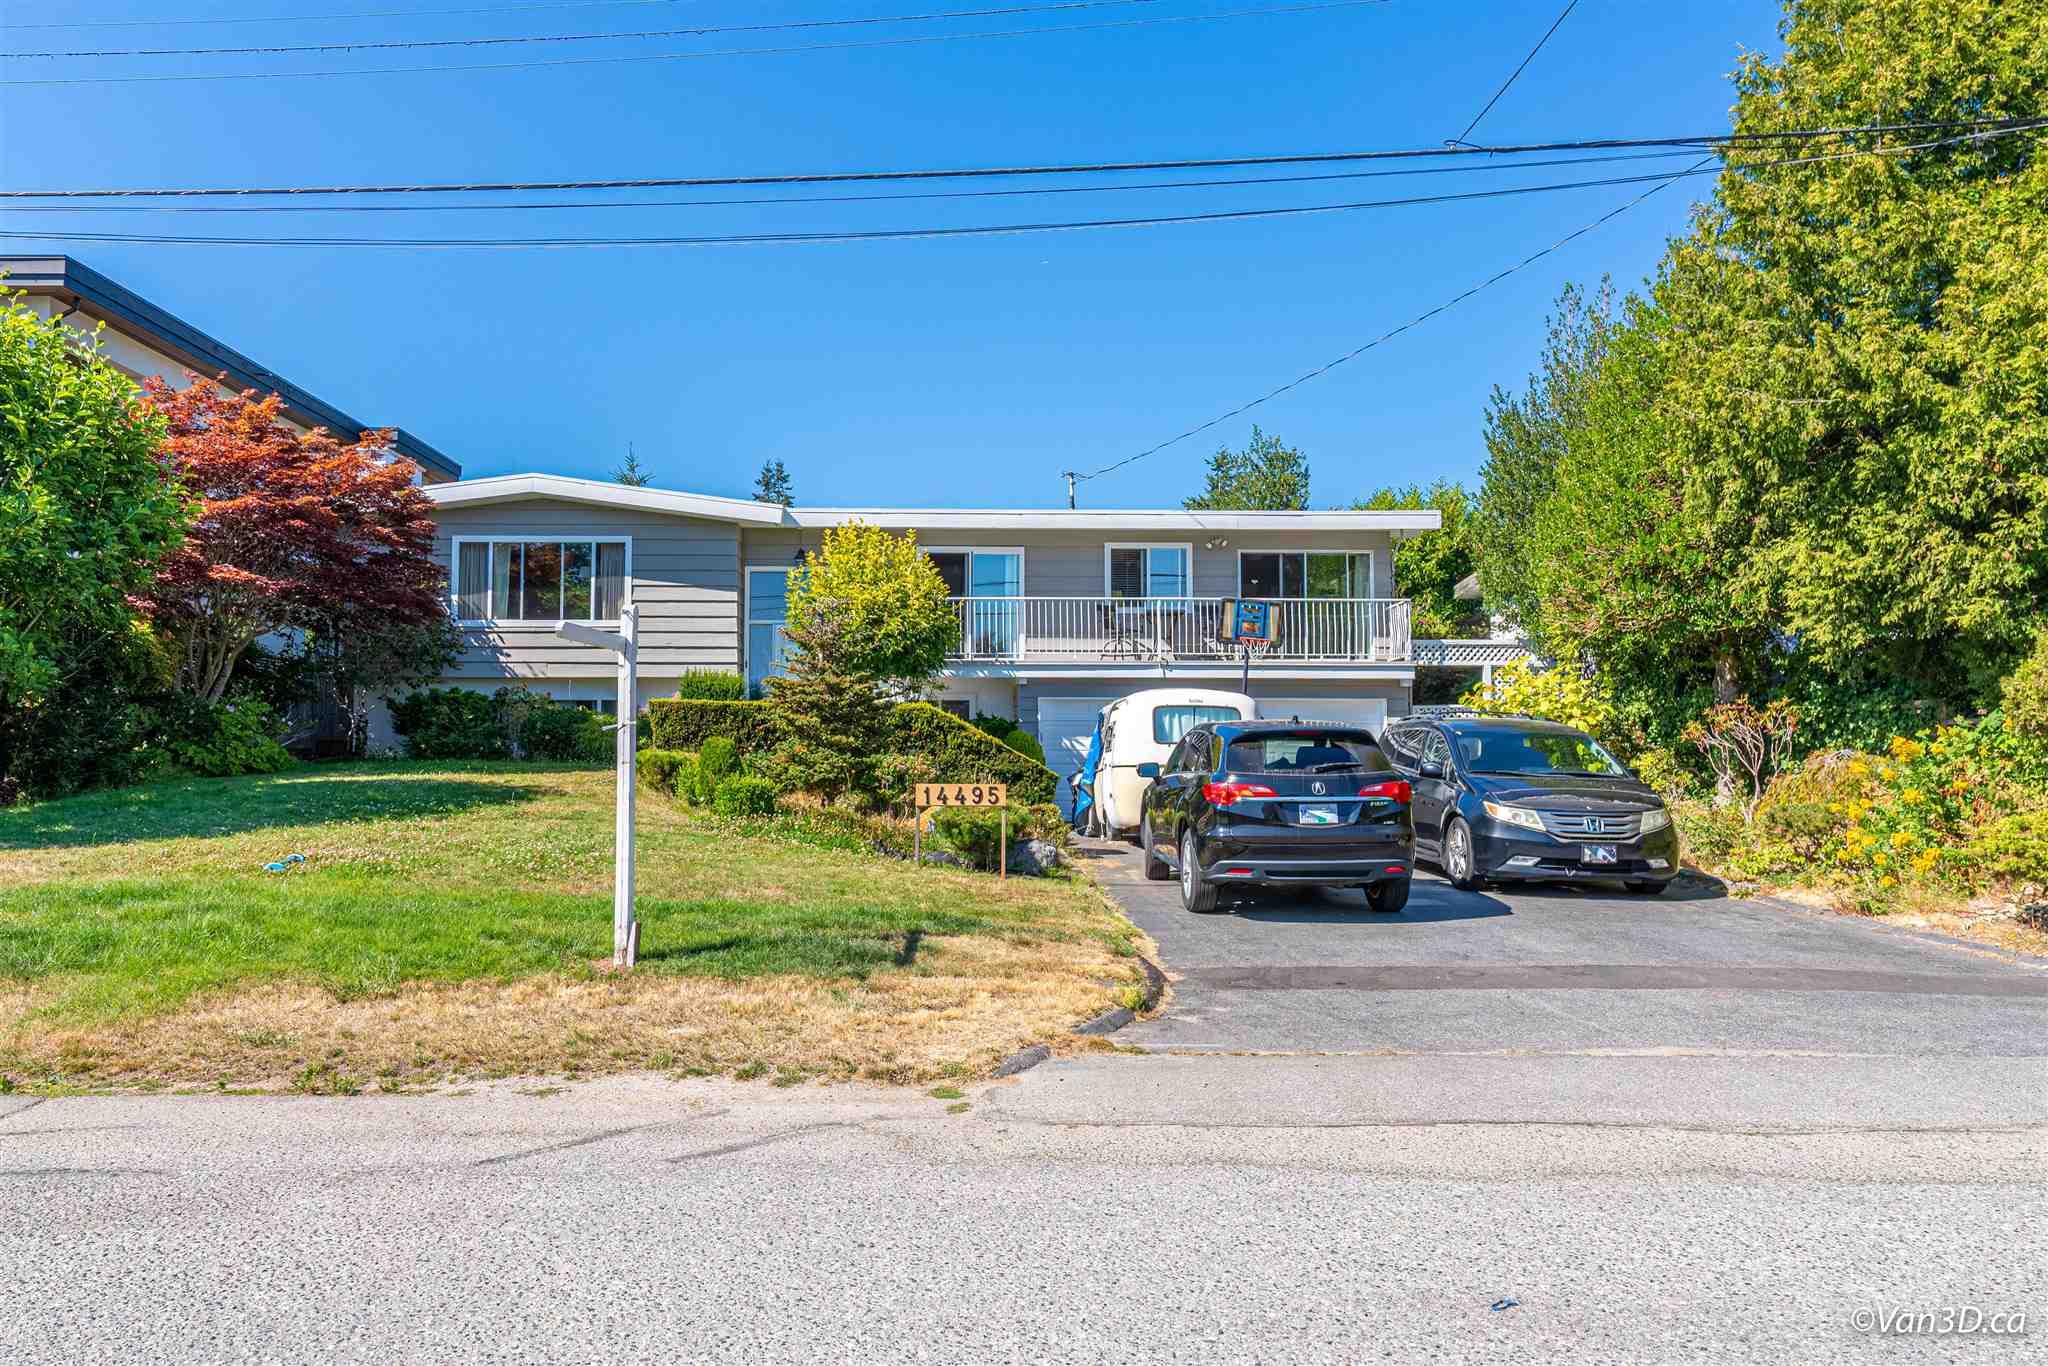 14495 MANN PARK CRESCENT - White Rock House/Single Family for sale, 4 Bedrooms (R2604561)